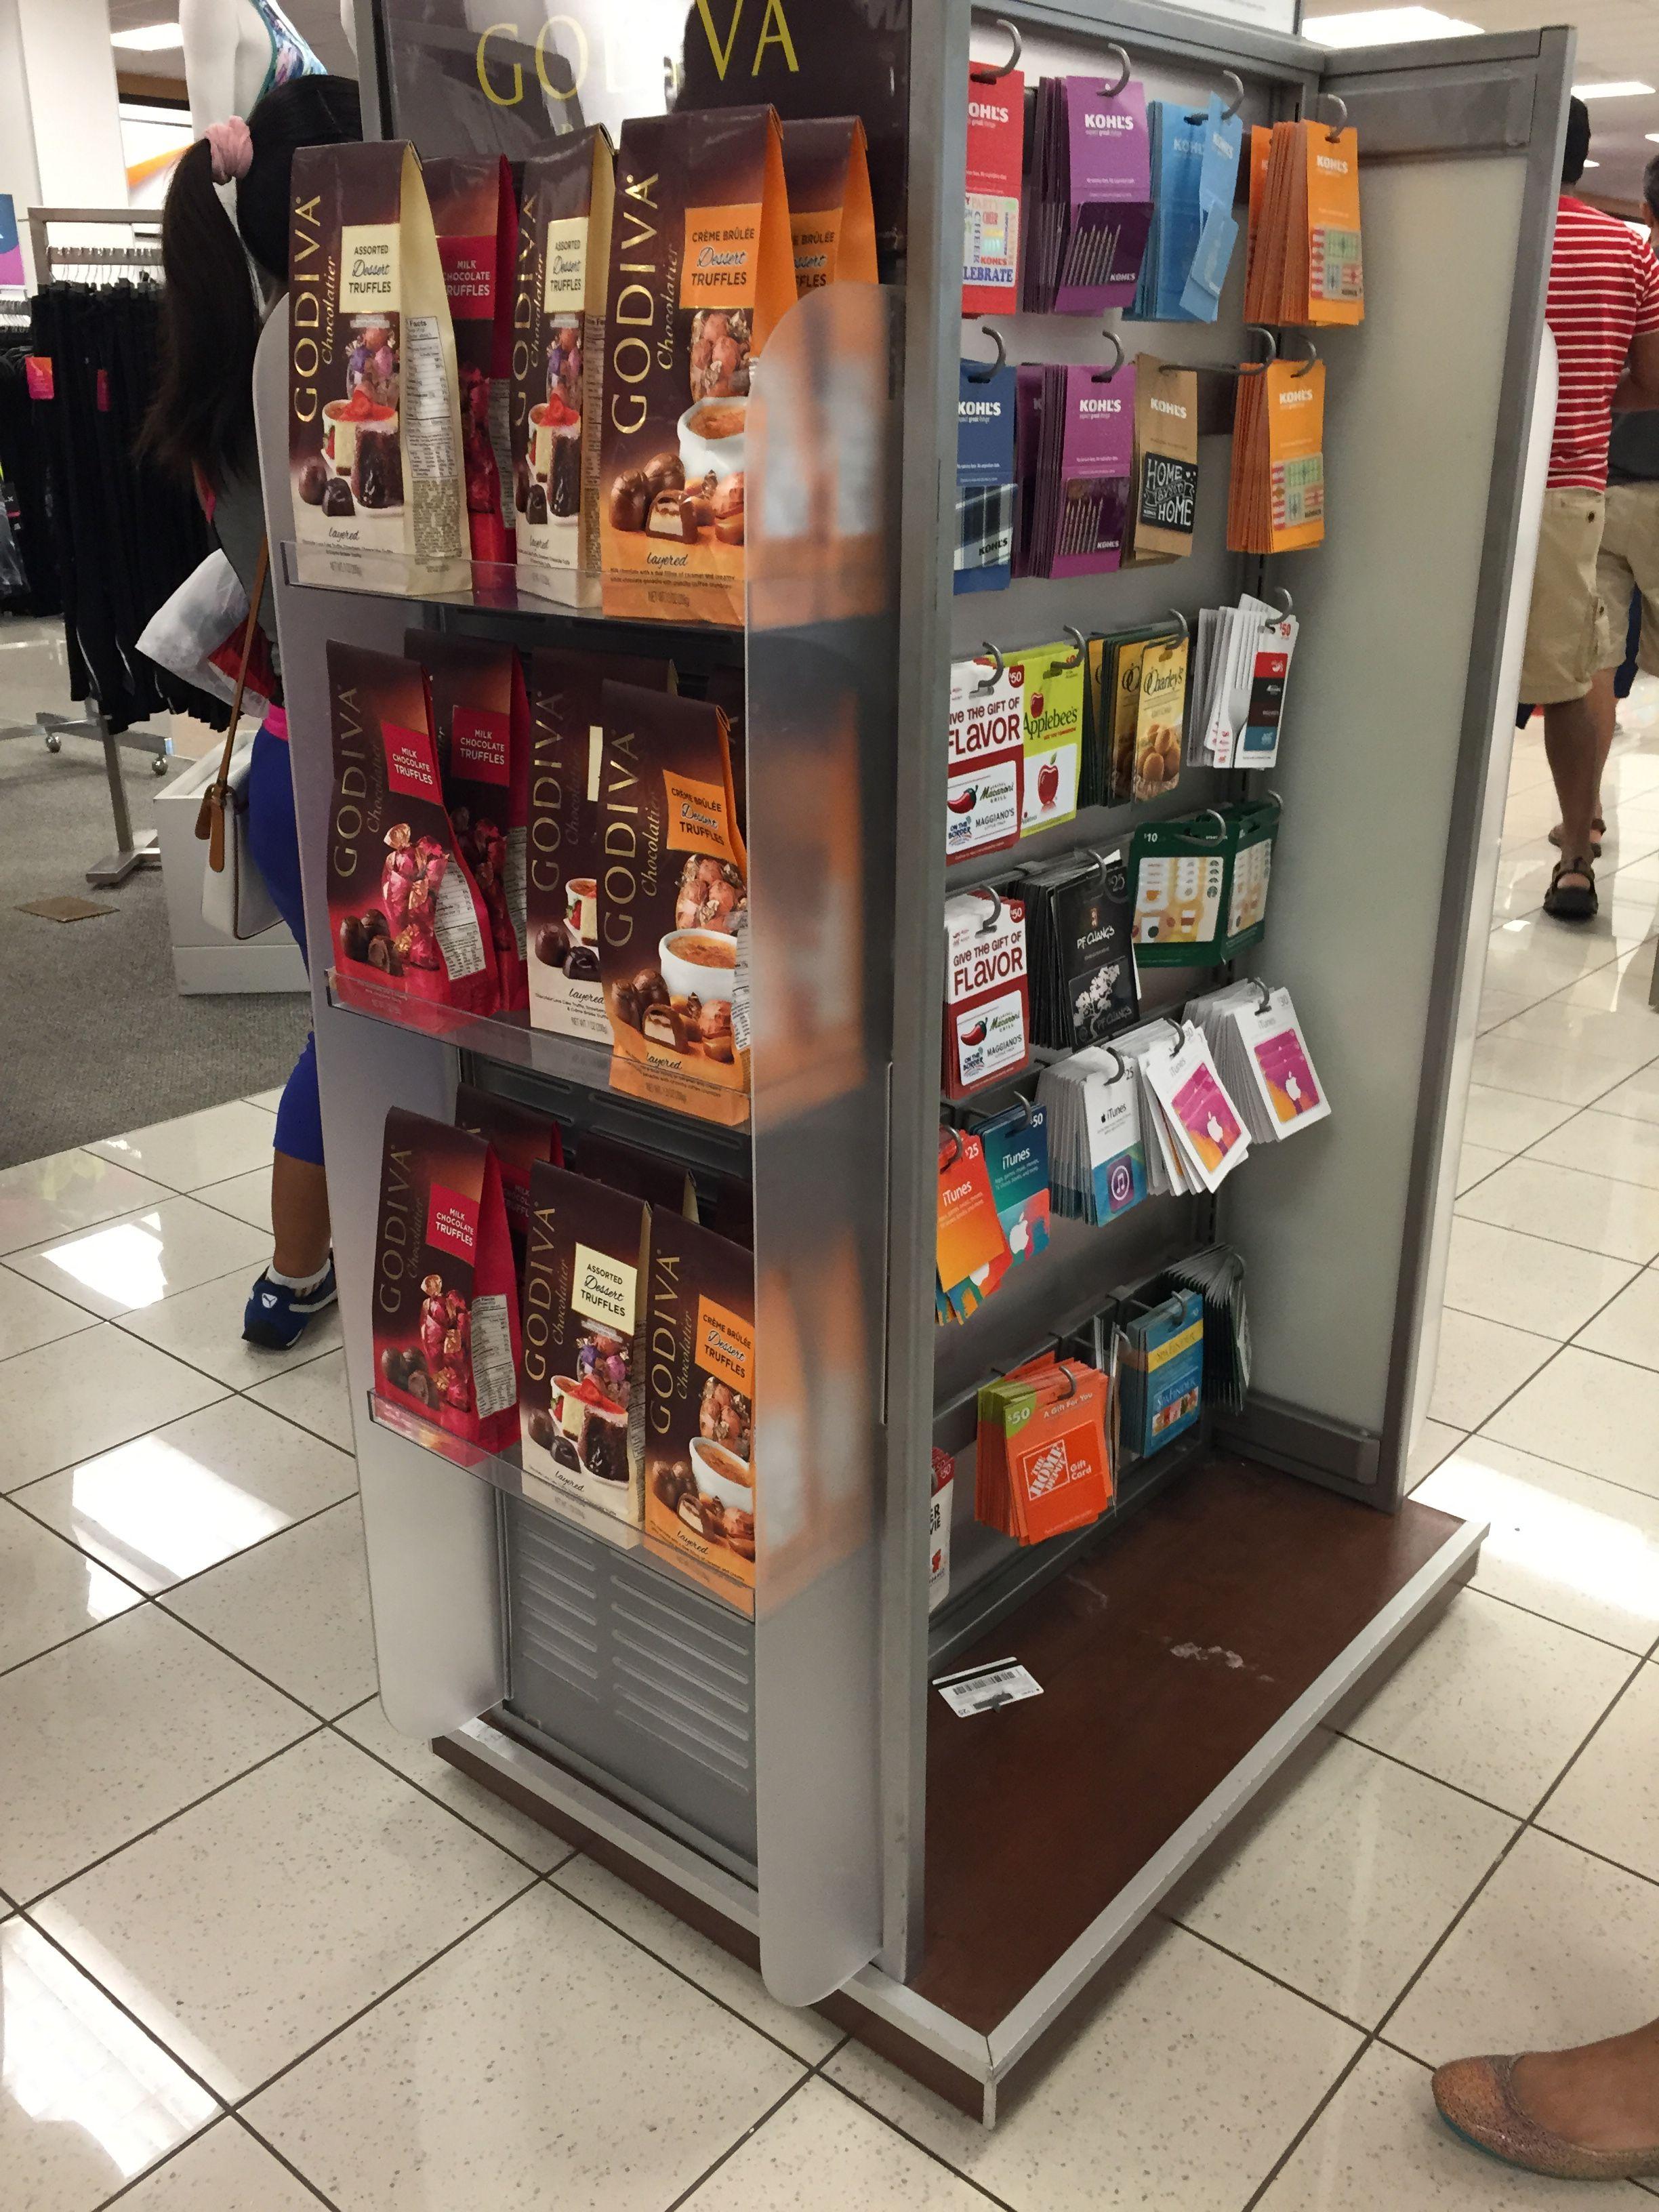 A chocolate and gift card shelf near the cashier Shelves